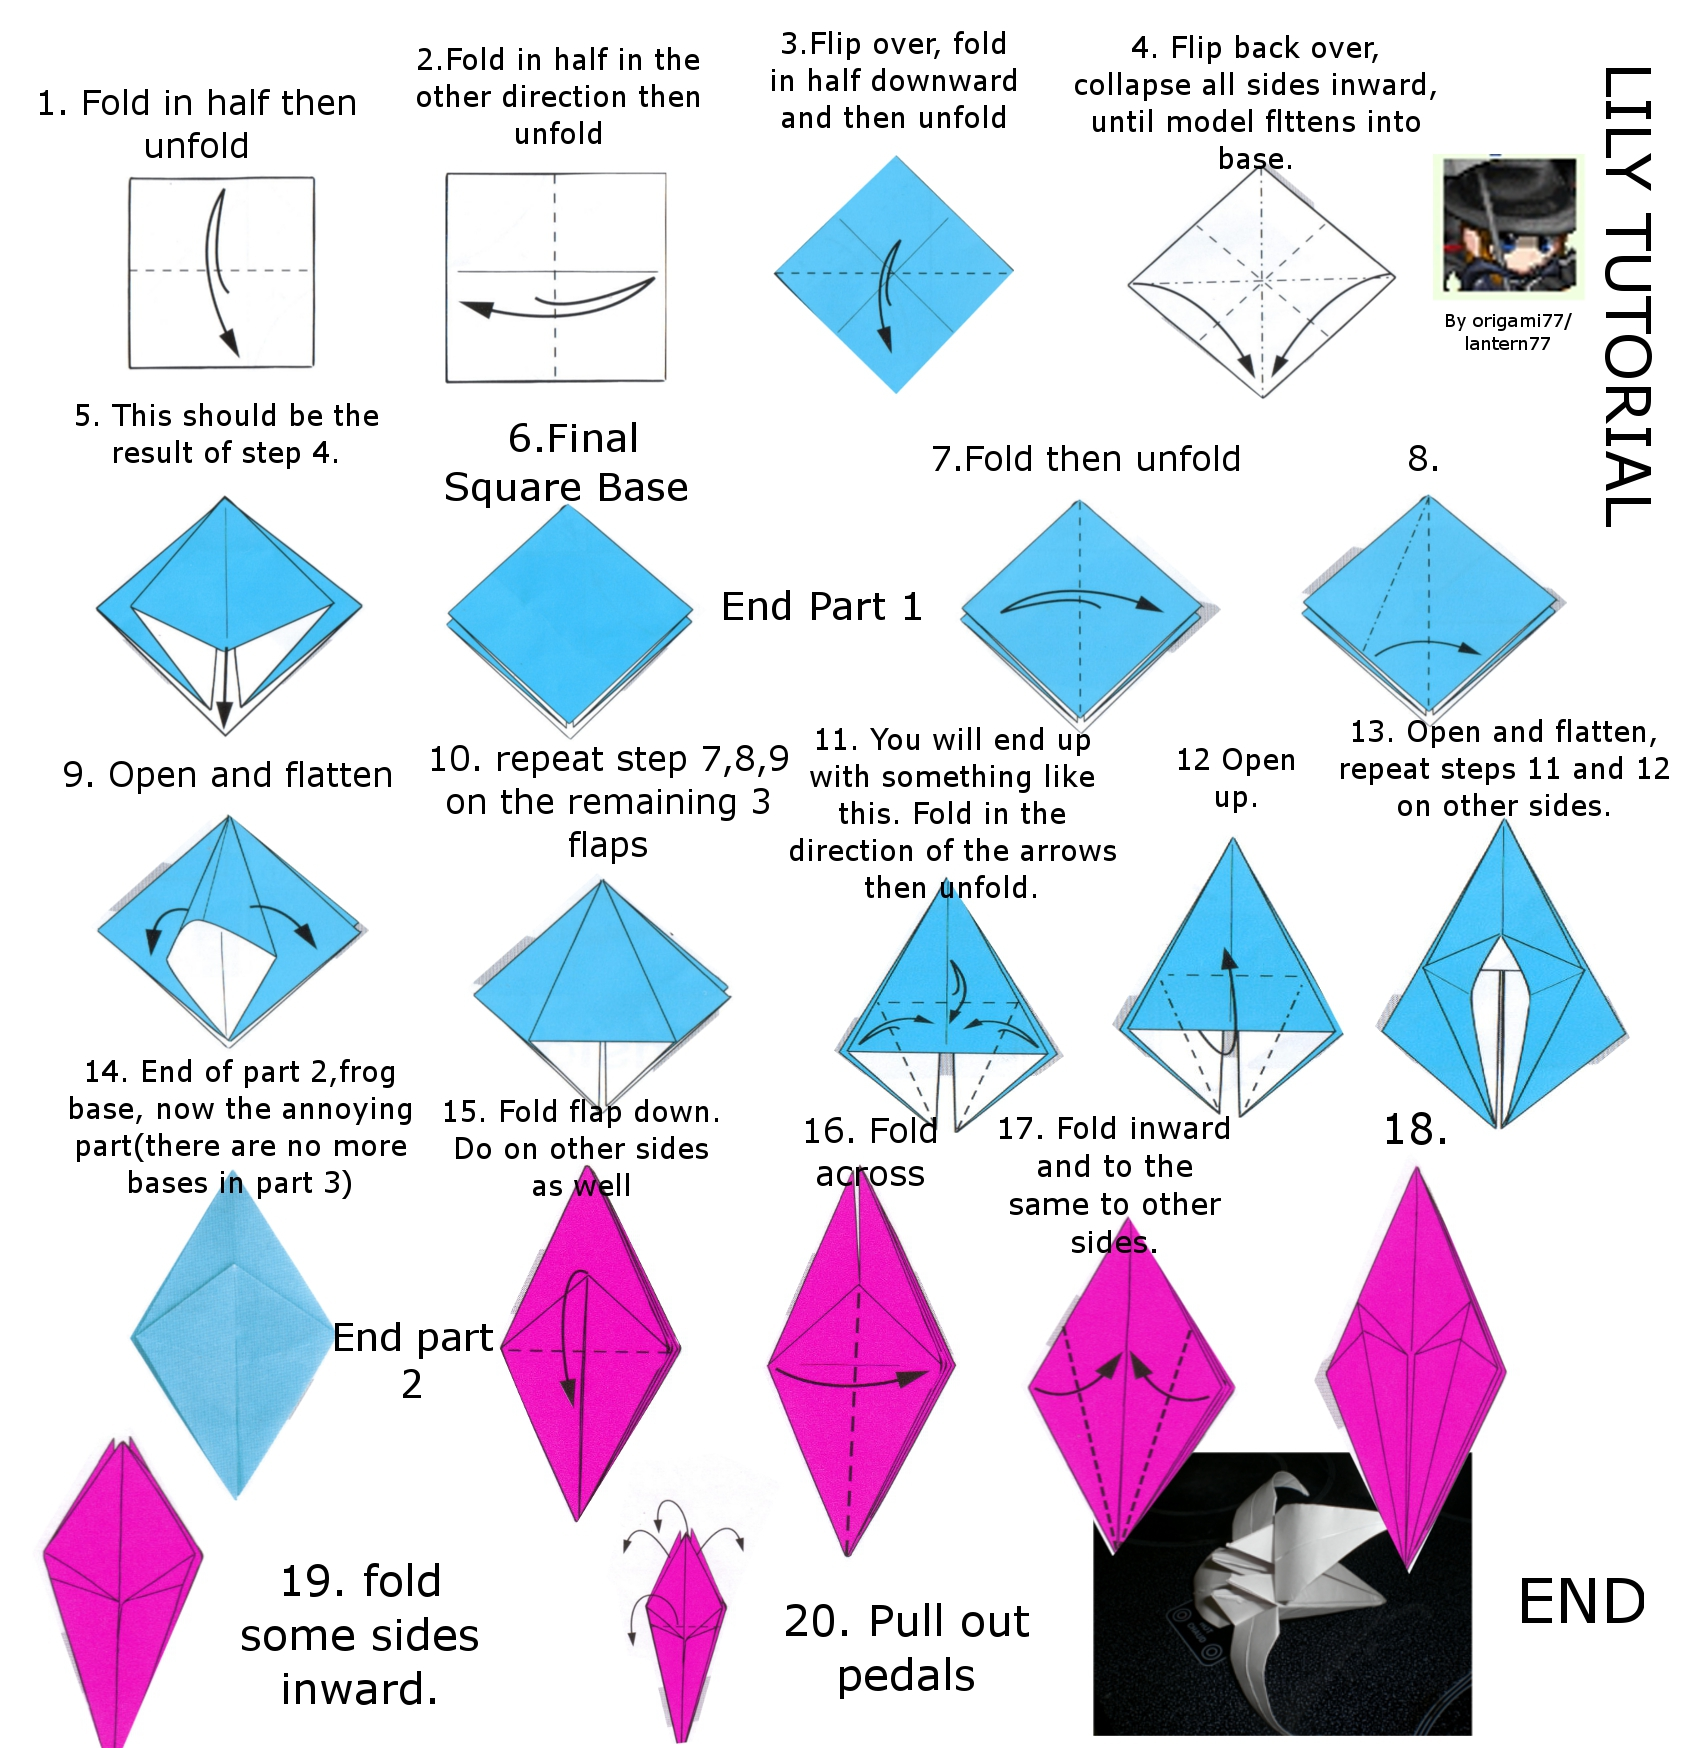 Lily or Iris origami tutorial by lantern77 on DeviantArt - photo#29